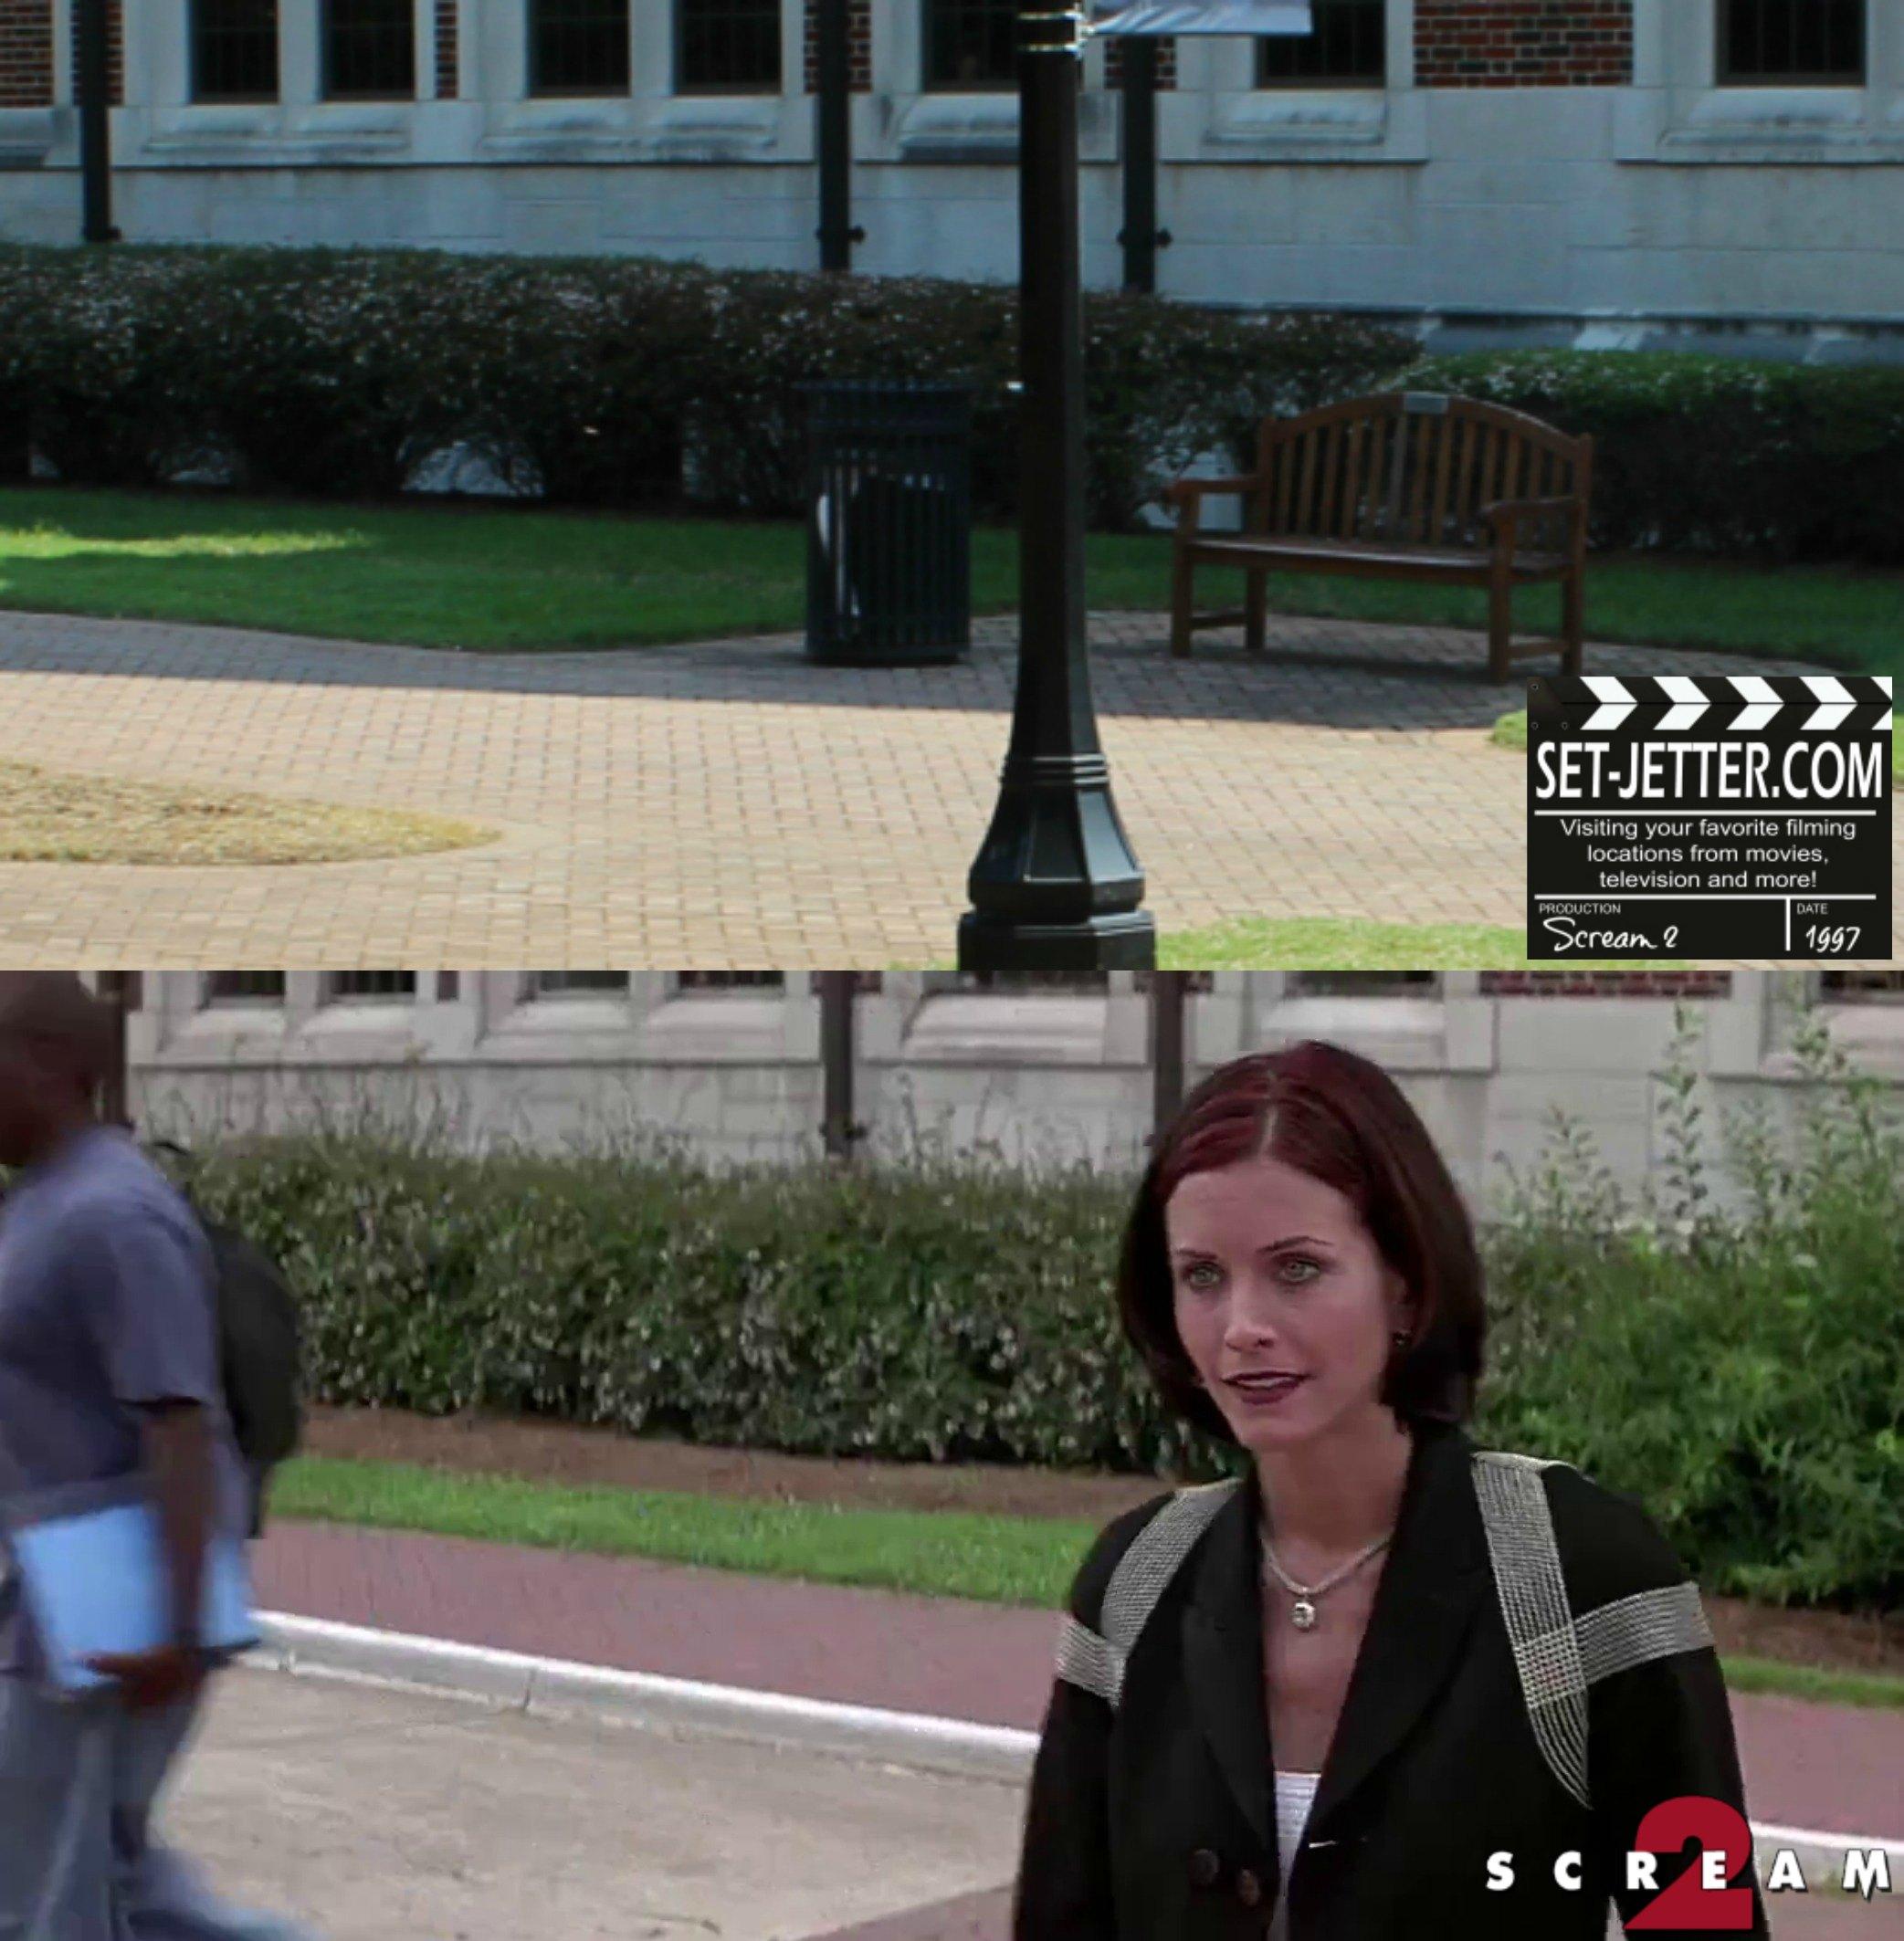 Scream 2 comparison 115.jpg